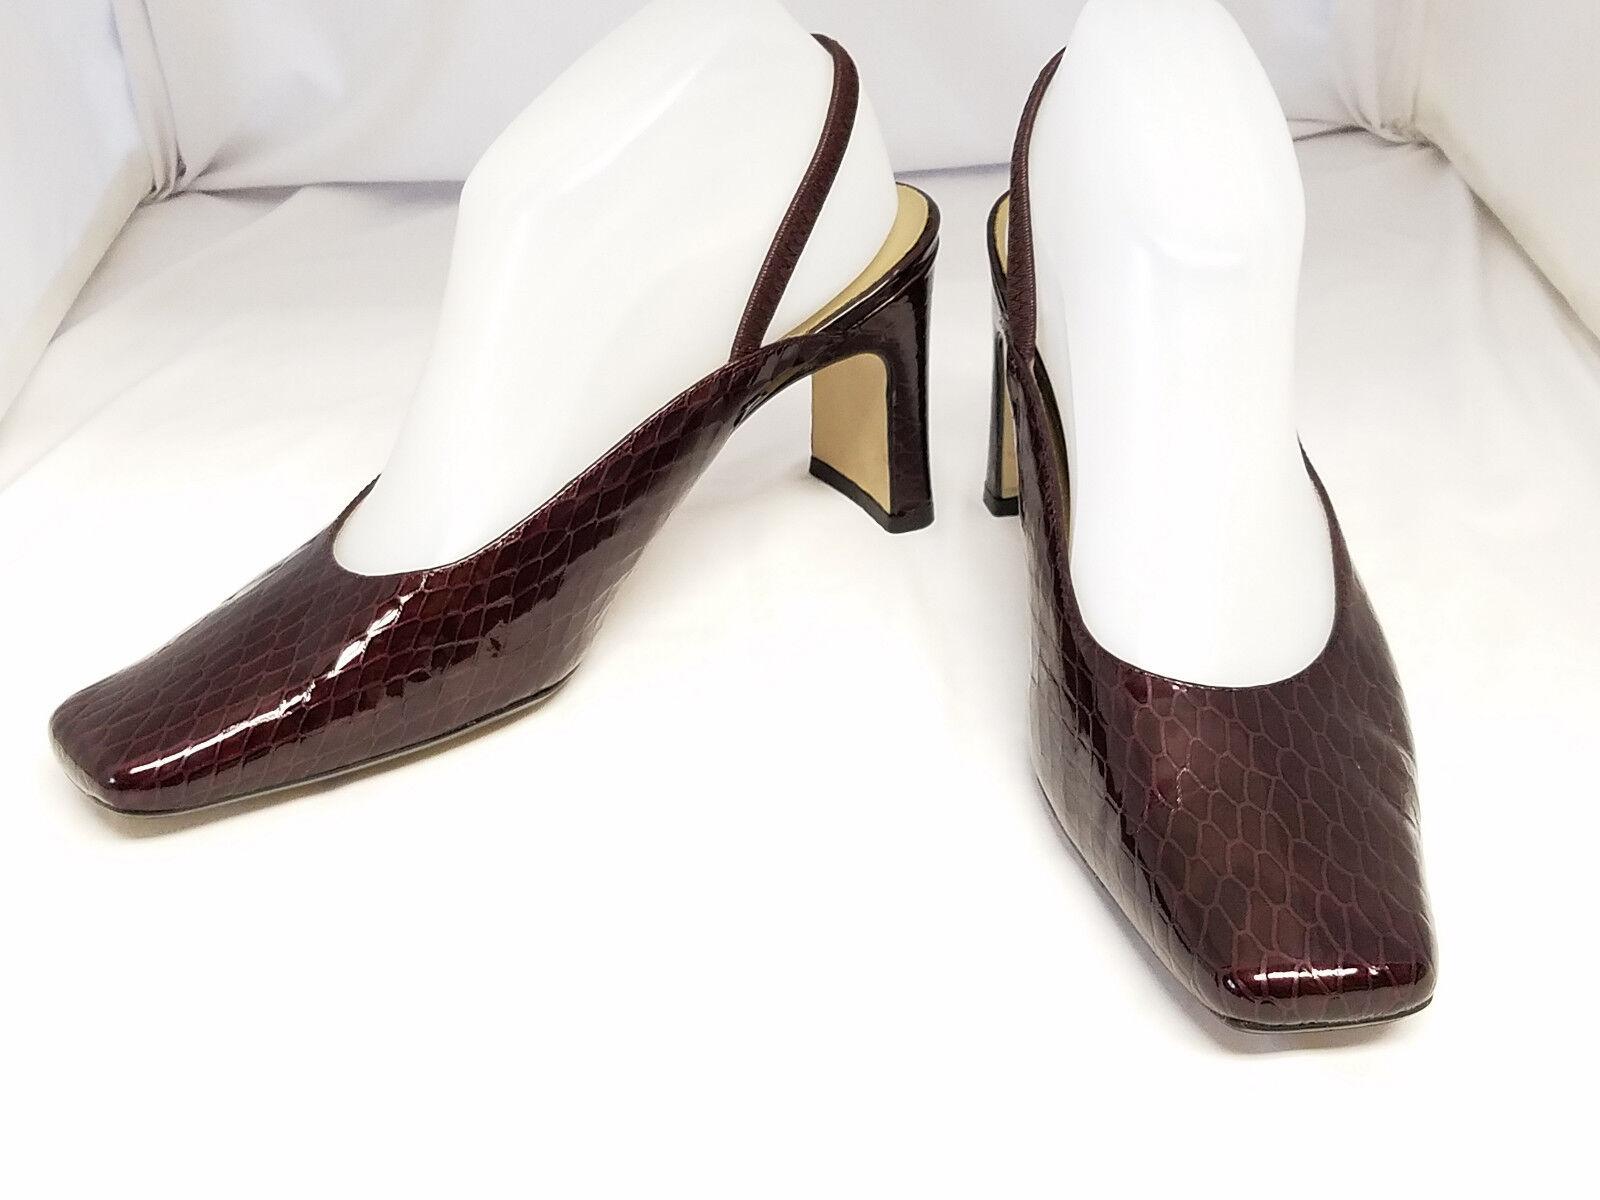 "Bellini 8.5M Leather Brown Square Toe Slingback Pump Size 8.5M Bellini 3.5"" Heel Reptile Patt 661638"